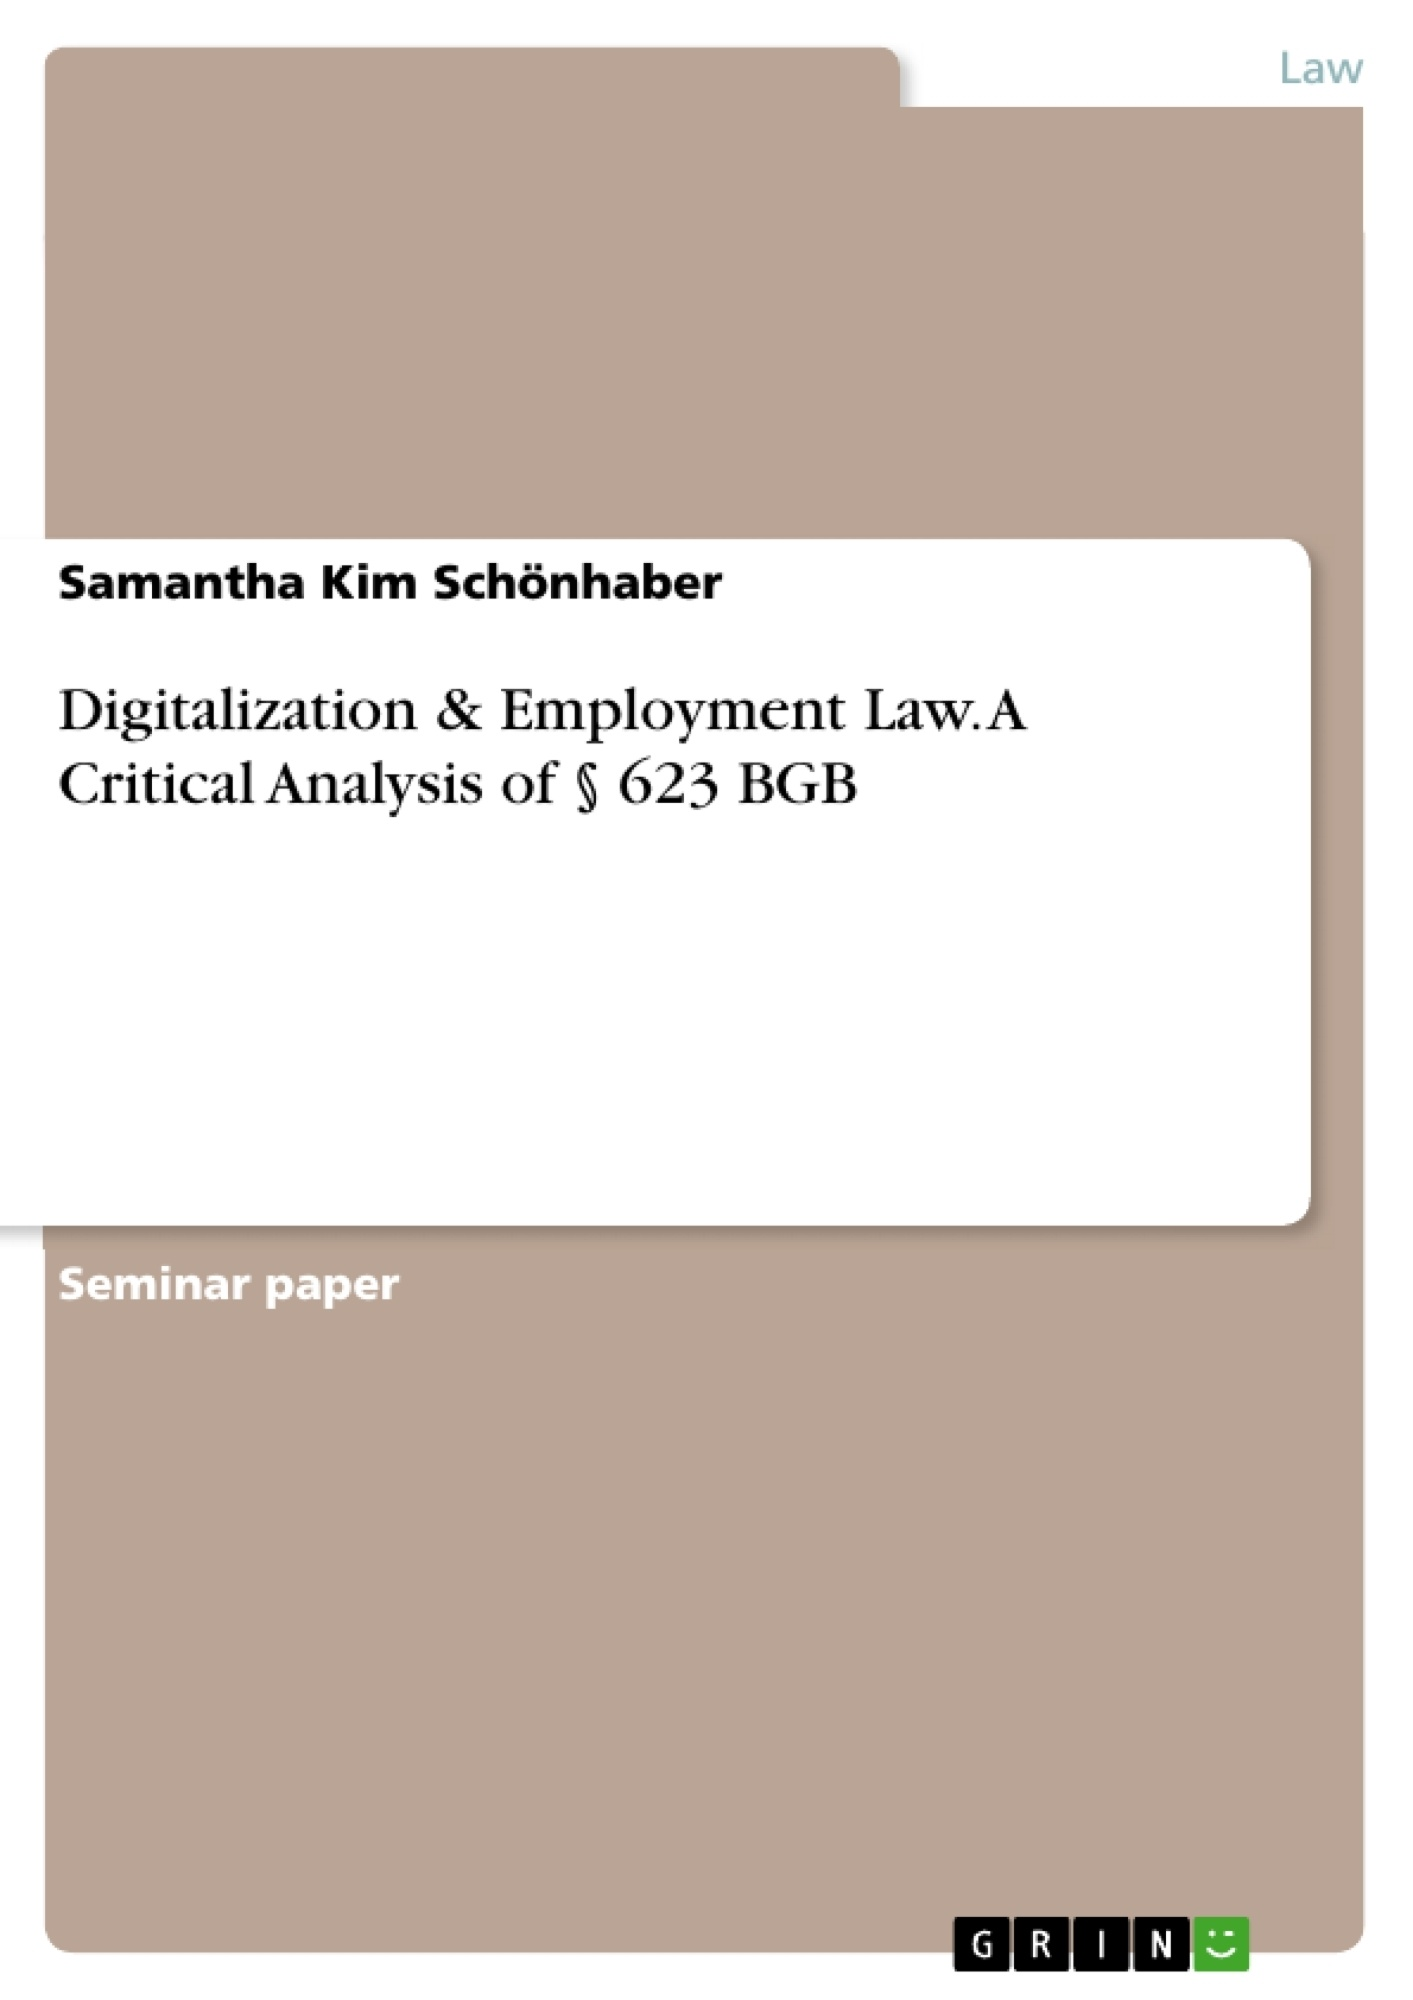 Title: Digitalization & Employment Law. A Critical Analysis of § 623 BGB